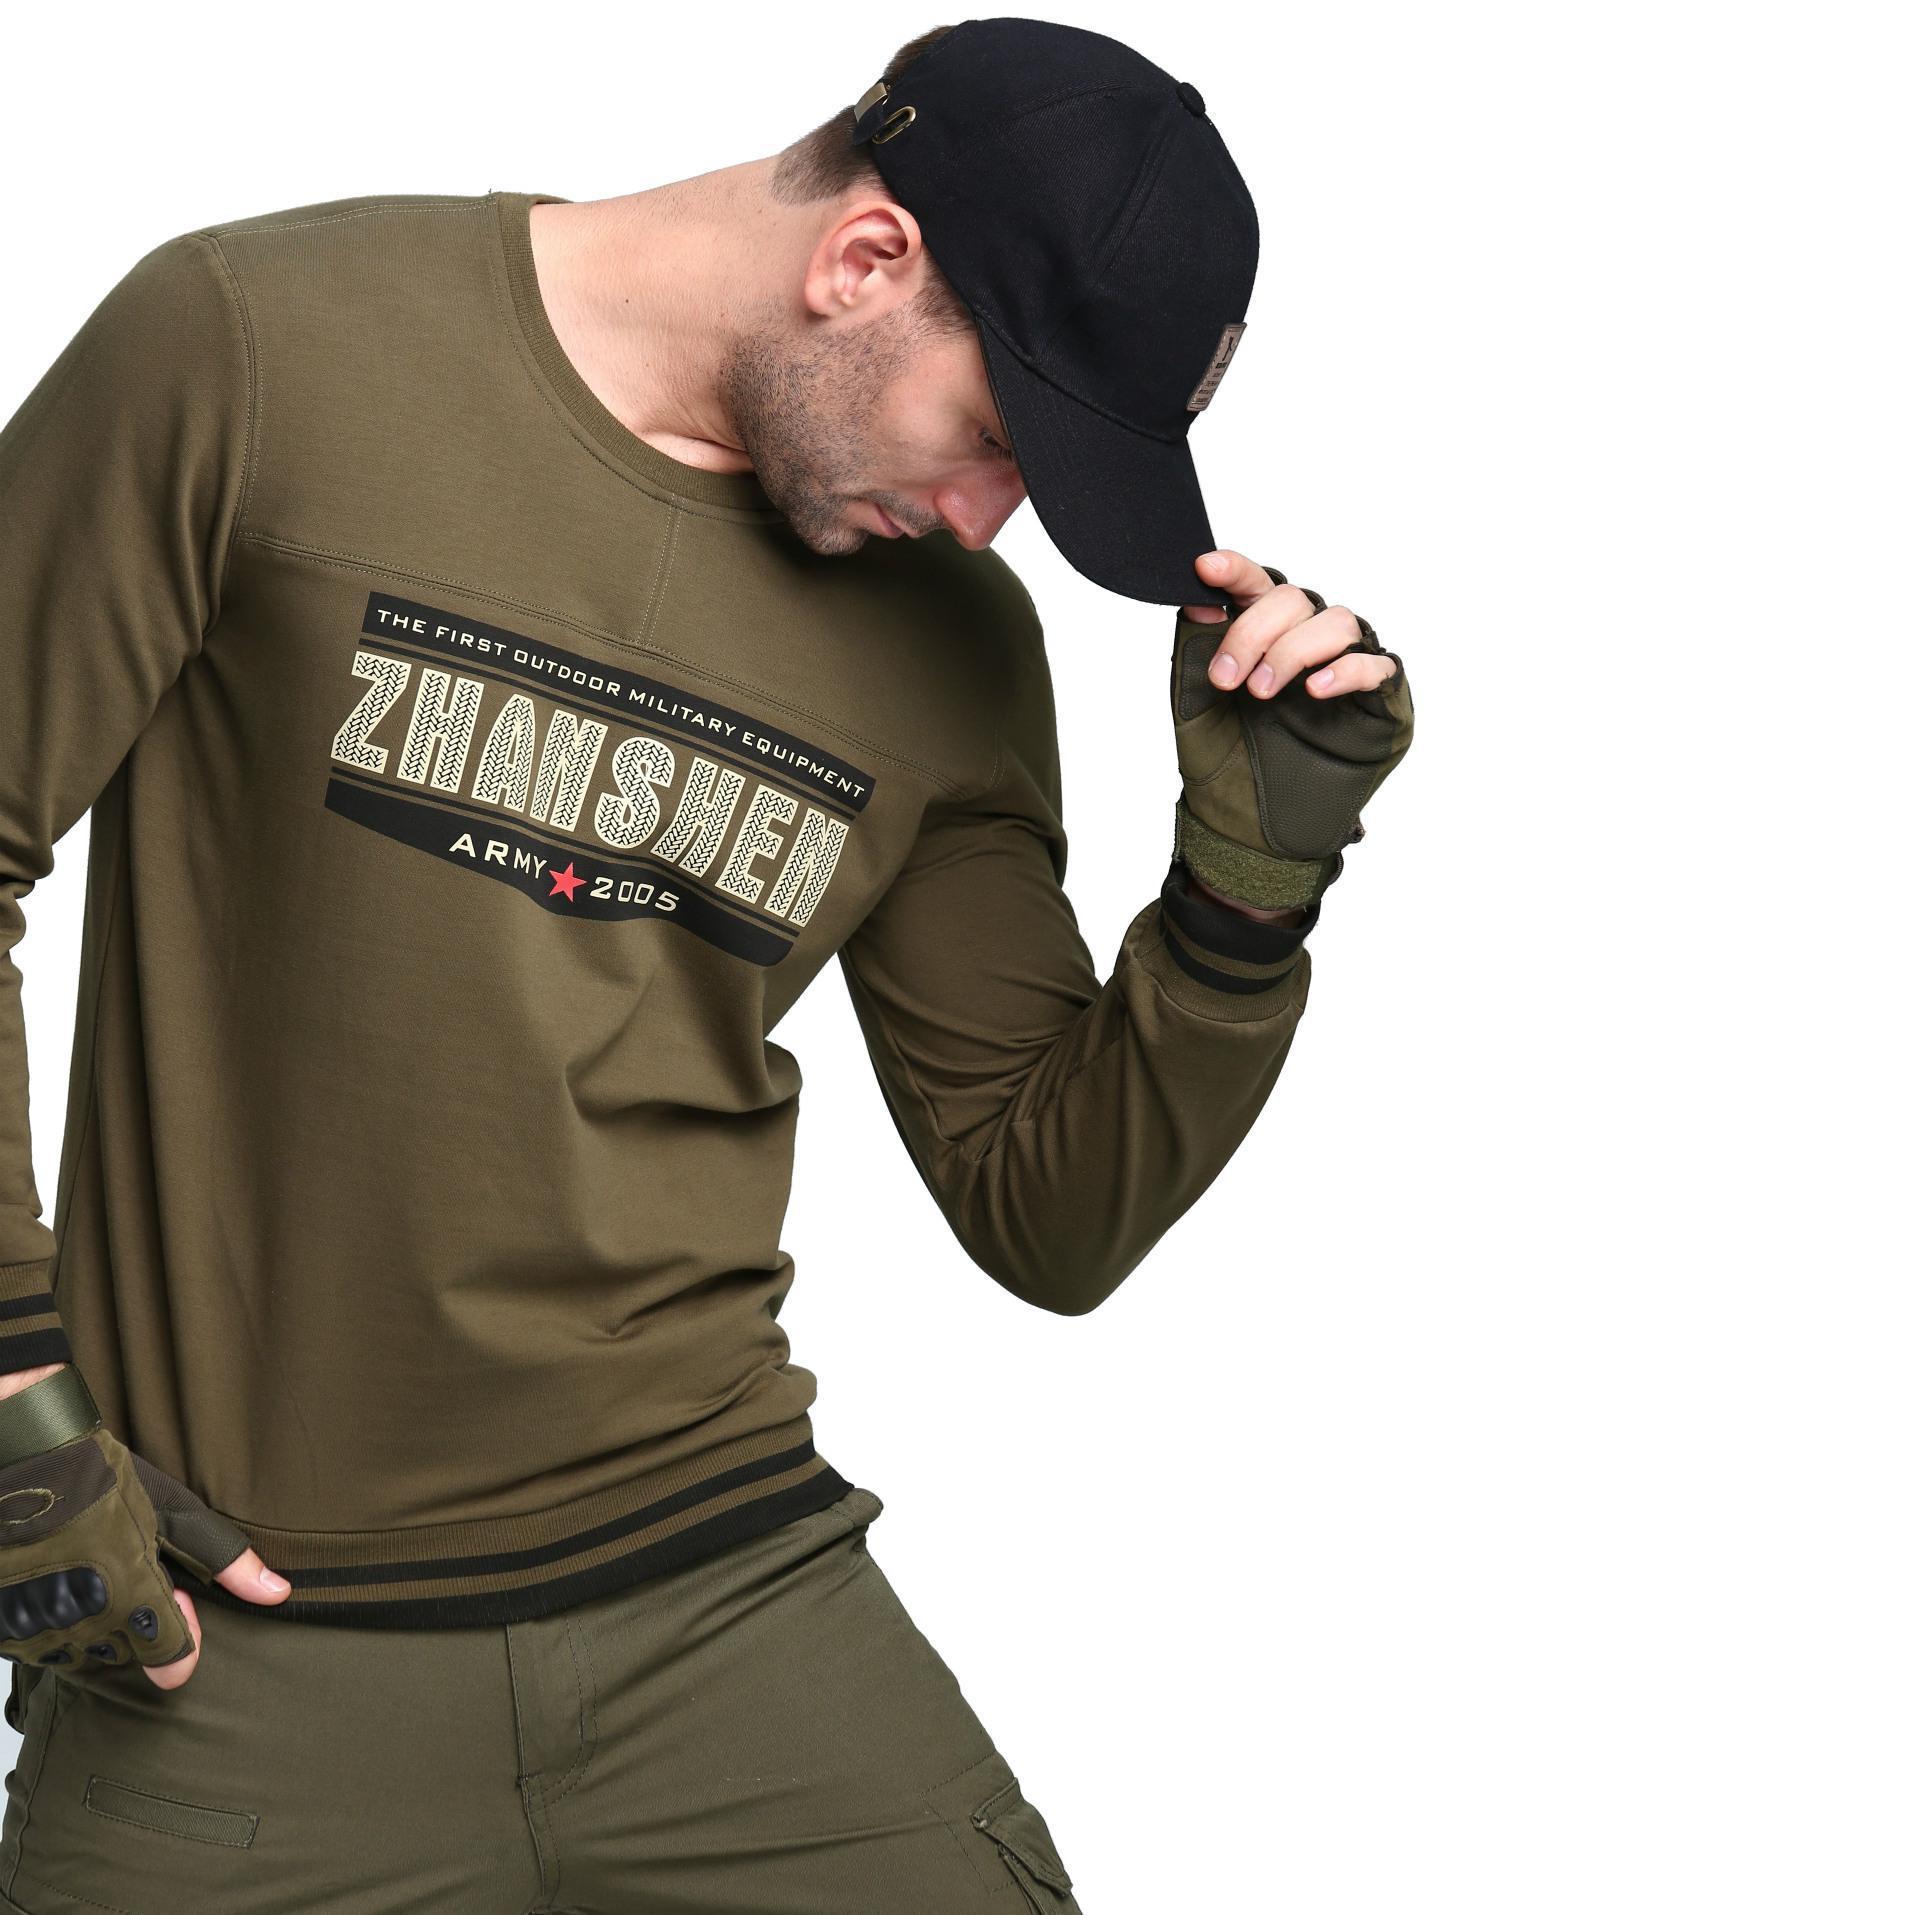 Zuoxiangru Outdoor Sports Hiking Camping Disciplinarian Thin Pullover Basic Fleece Clothing Tactical Thermal Jacket